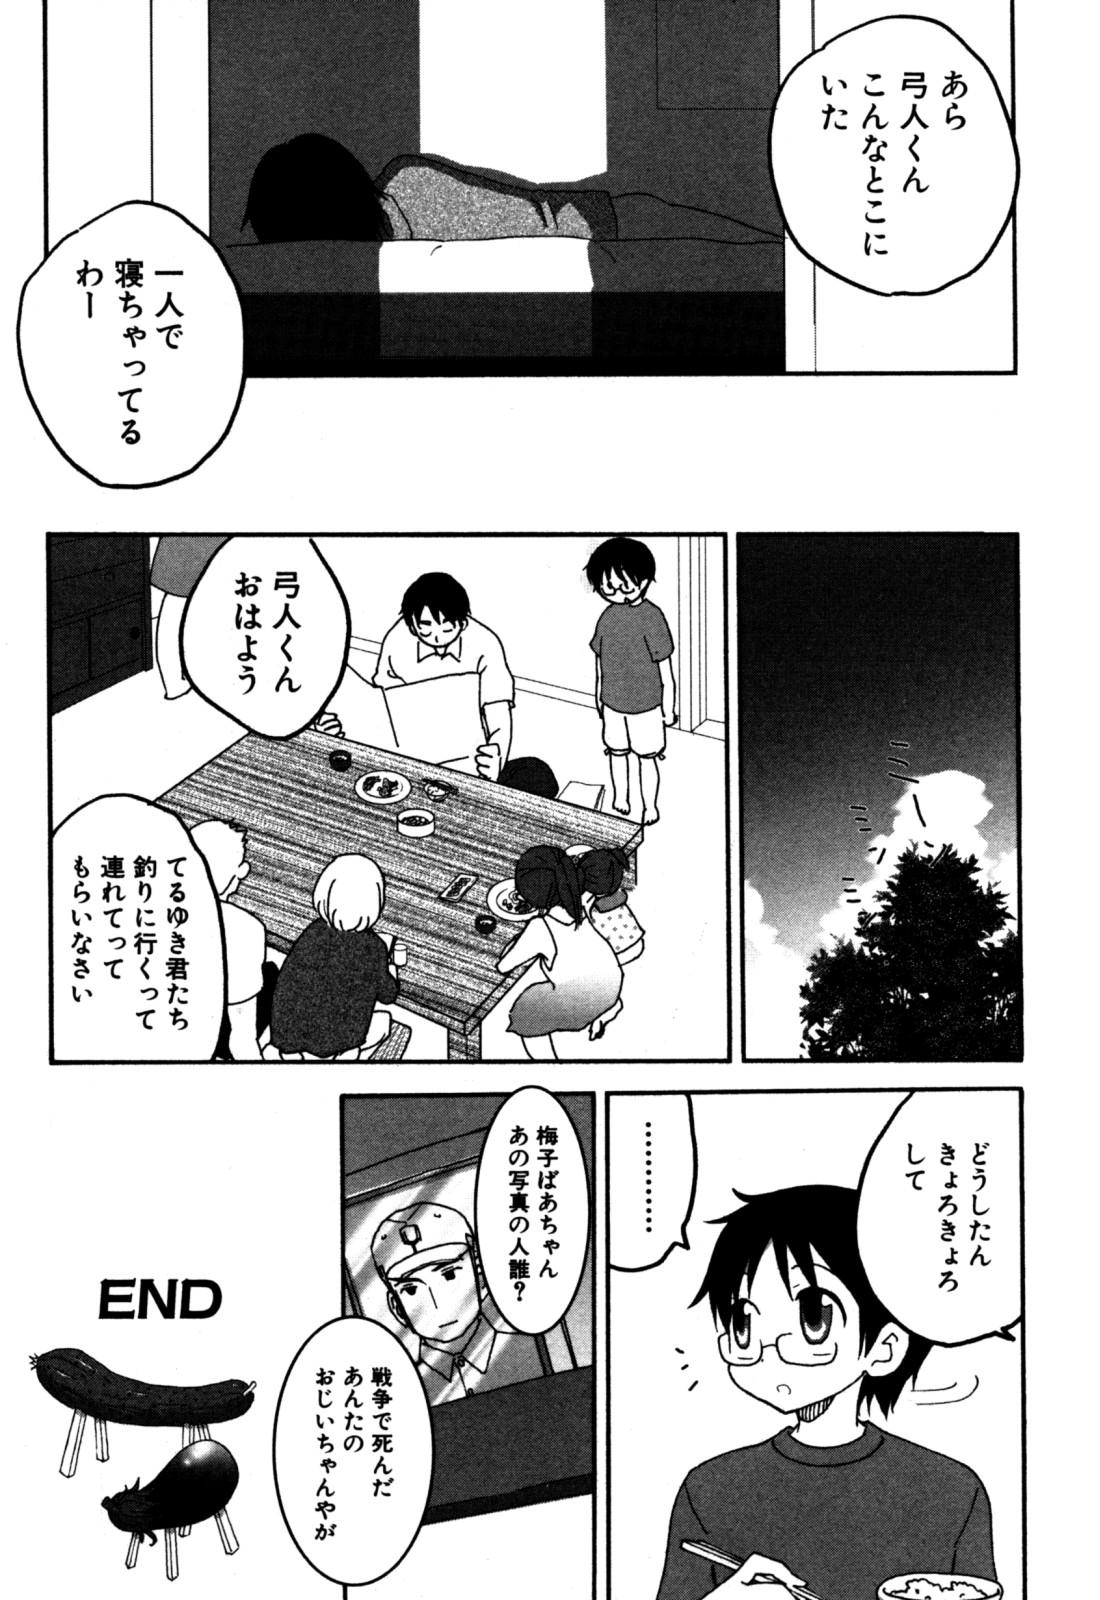 Eros Boys - Ero Shota 5 73